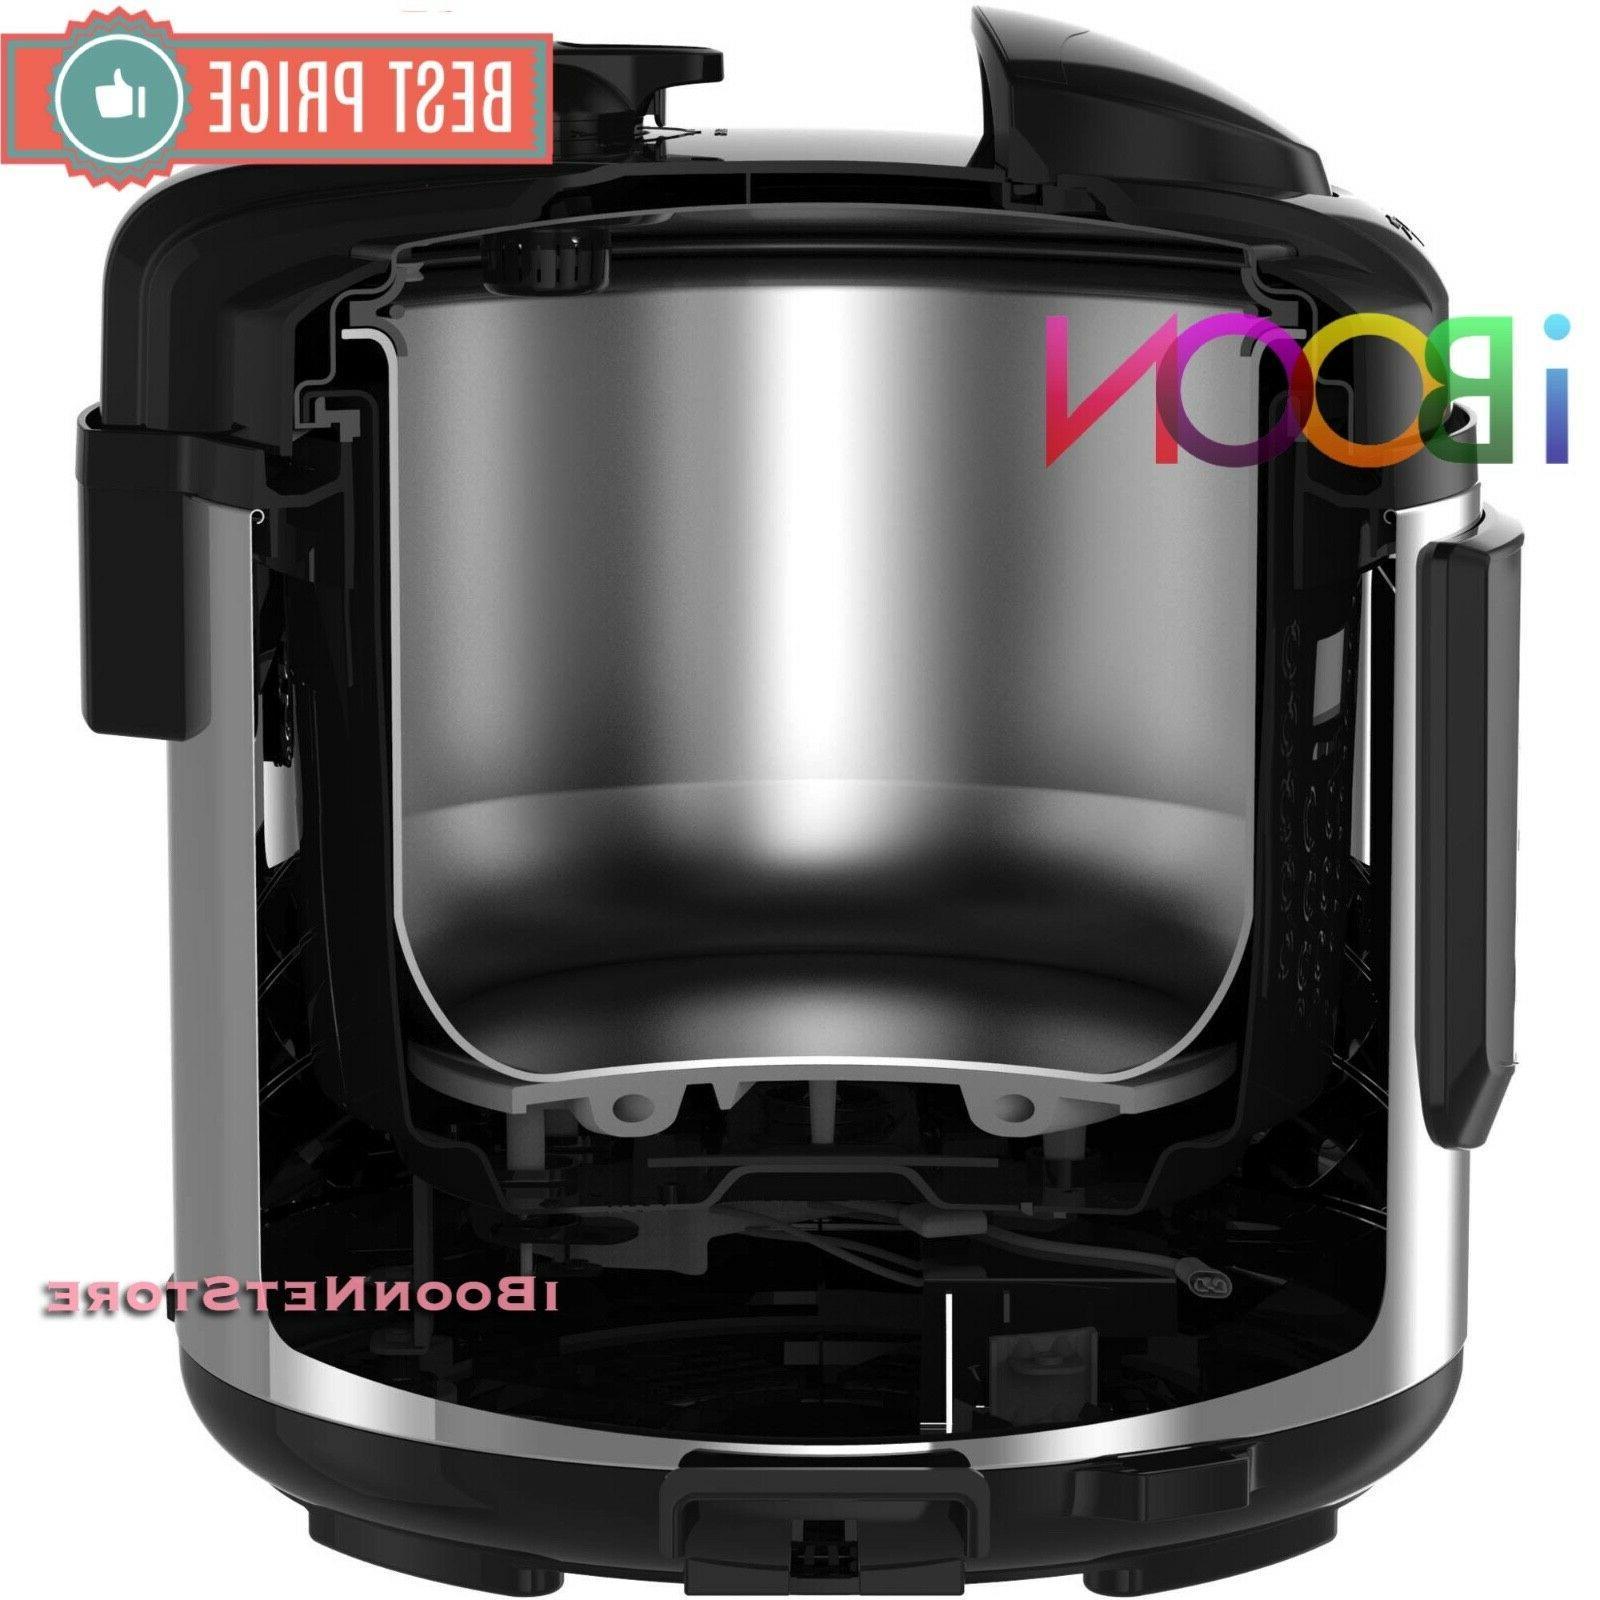 Instant Pot 6 6 in Programmable Pressure Cooker Cooker